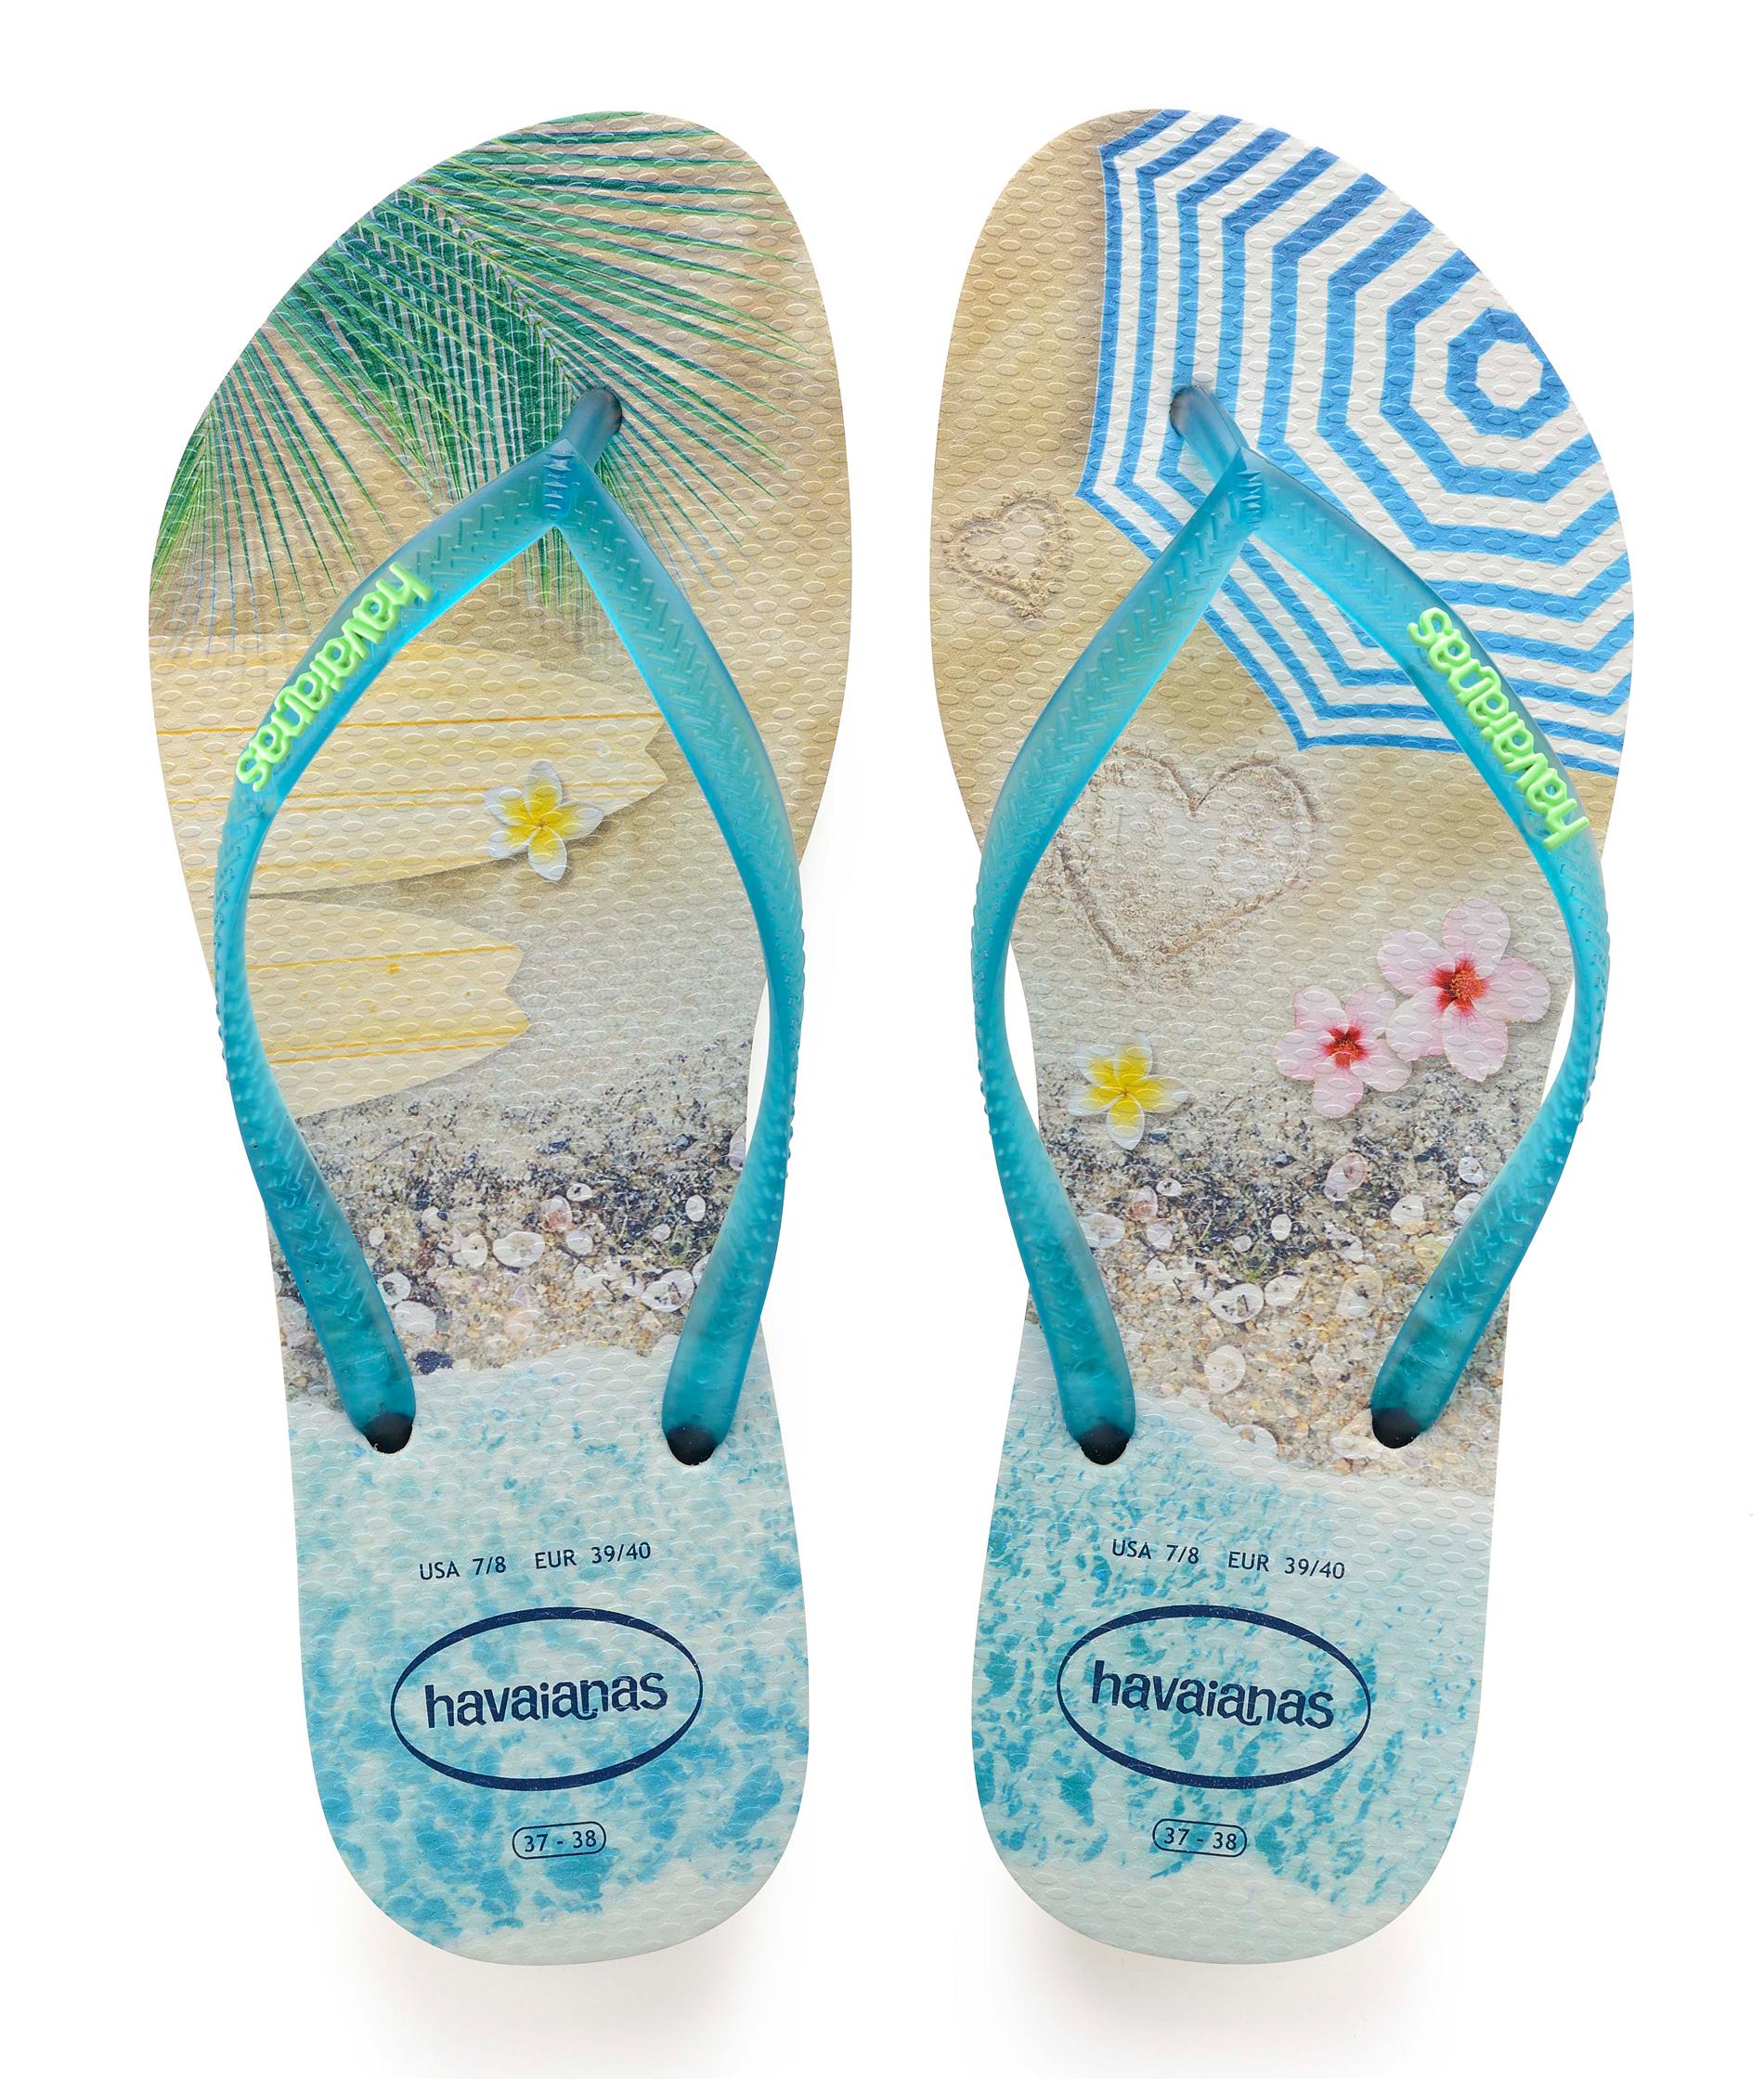 Havaianas Slim Paisage - Beige/Turquoise